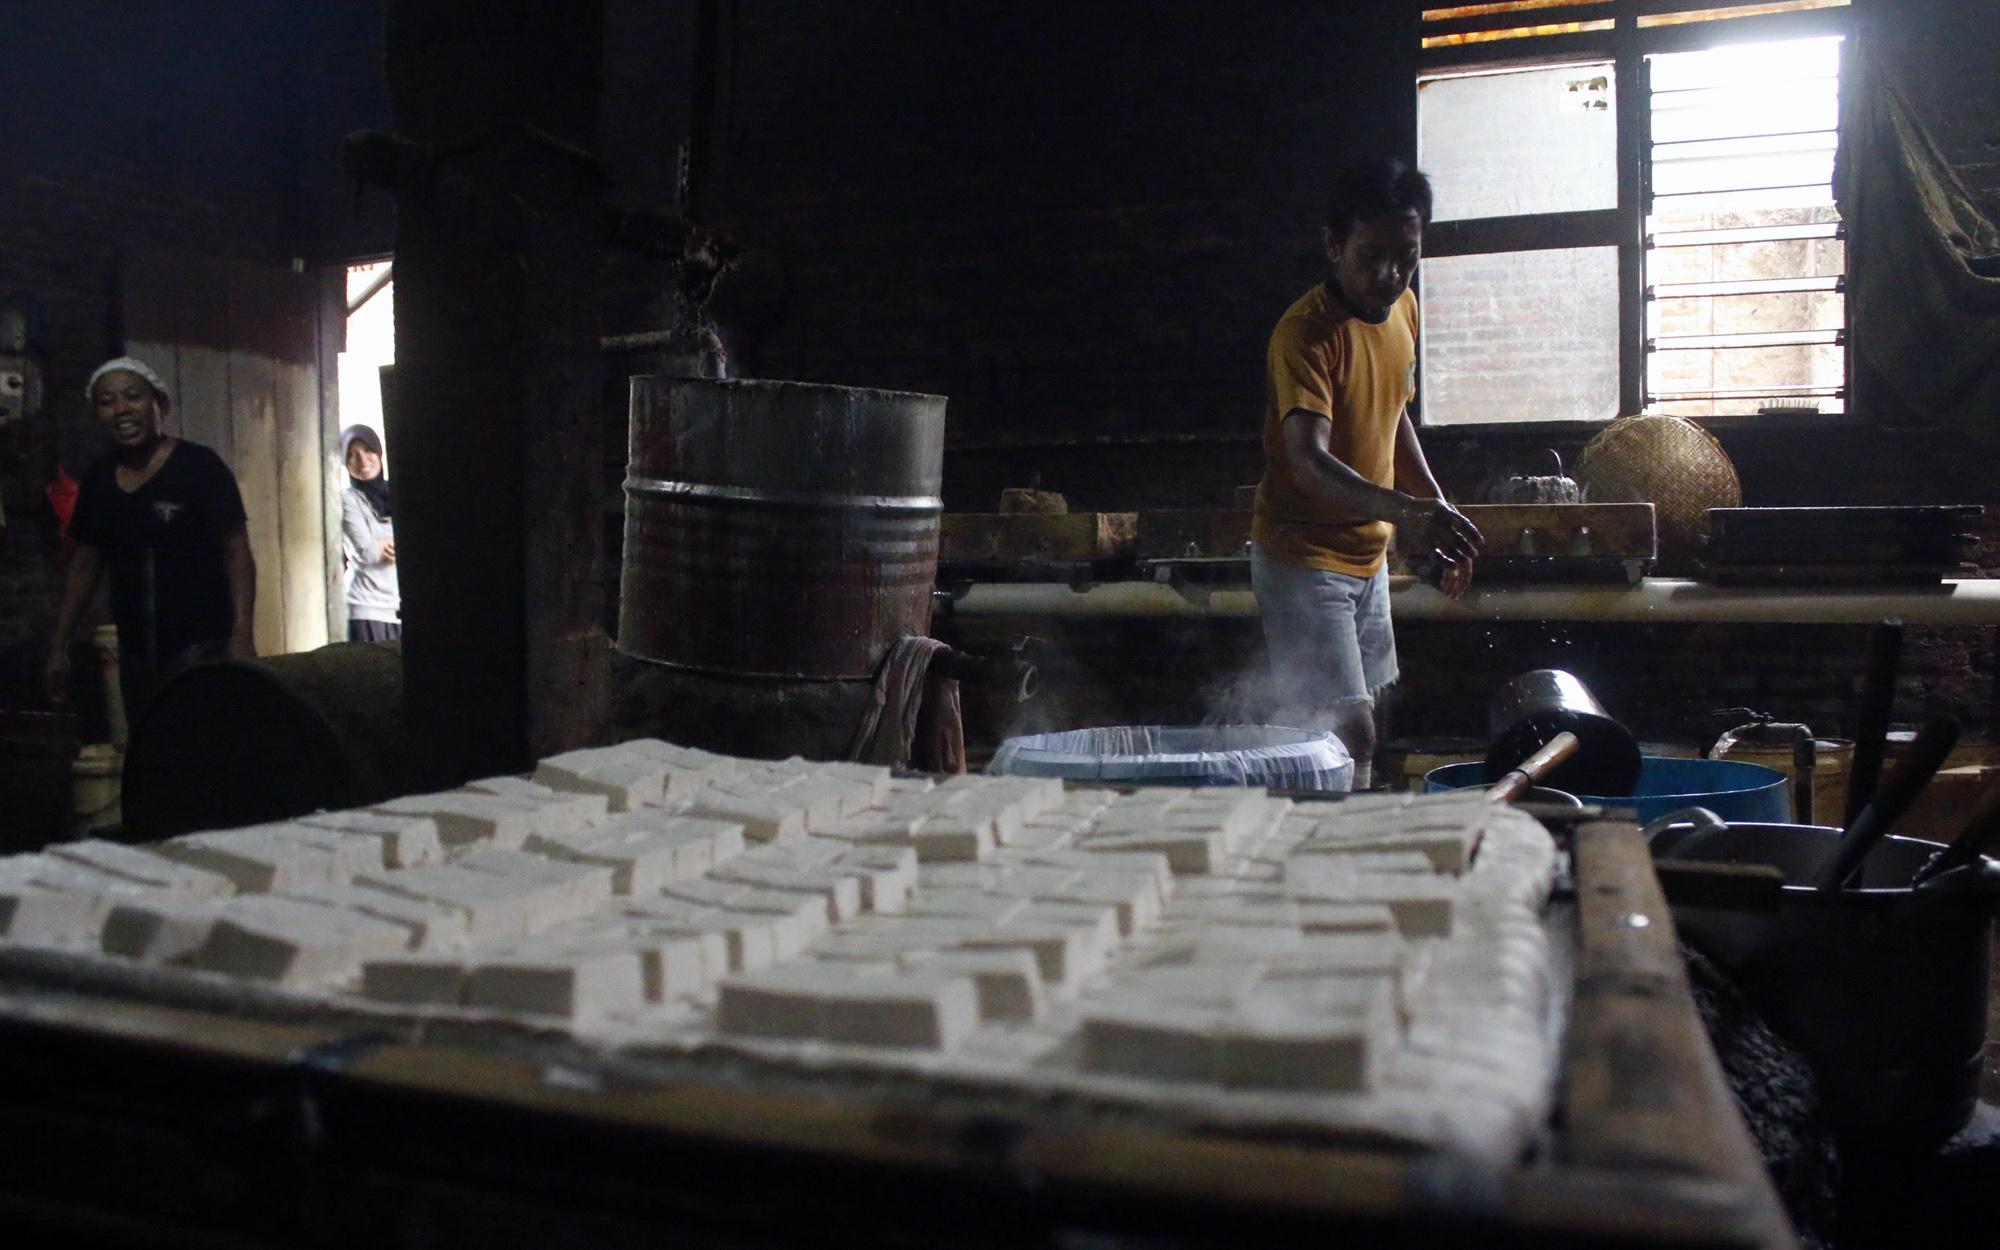 Suasana pembuatan tahu di salah satu rumah pengerajin di Kelurahan Gunung Sulah, Way Halim, Bandar Lampung. (Lampungnews/El Shinta)